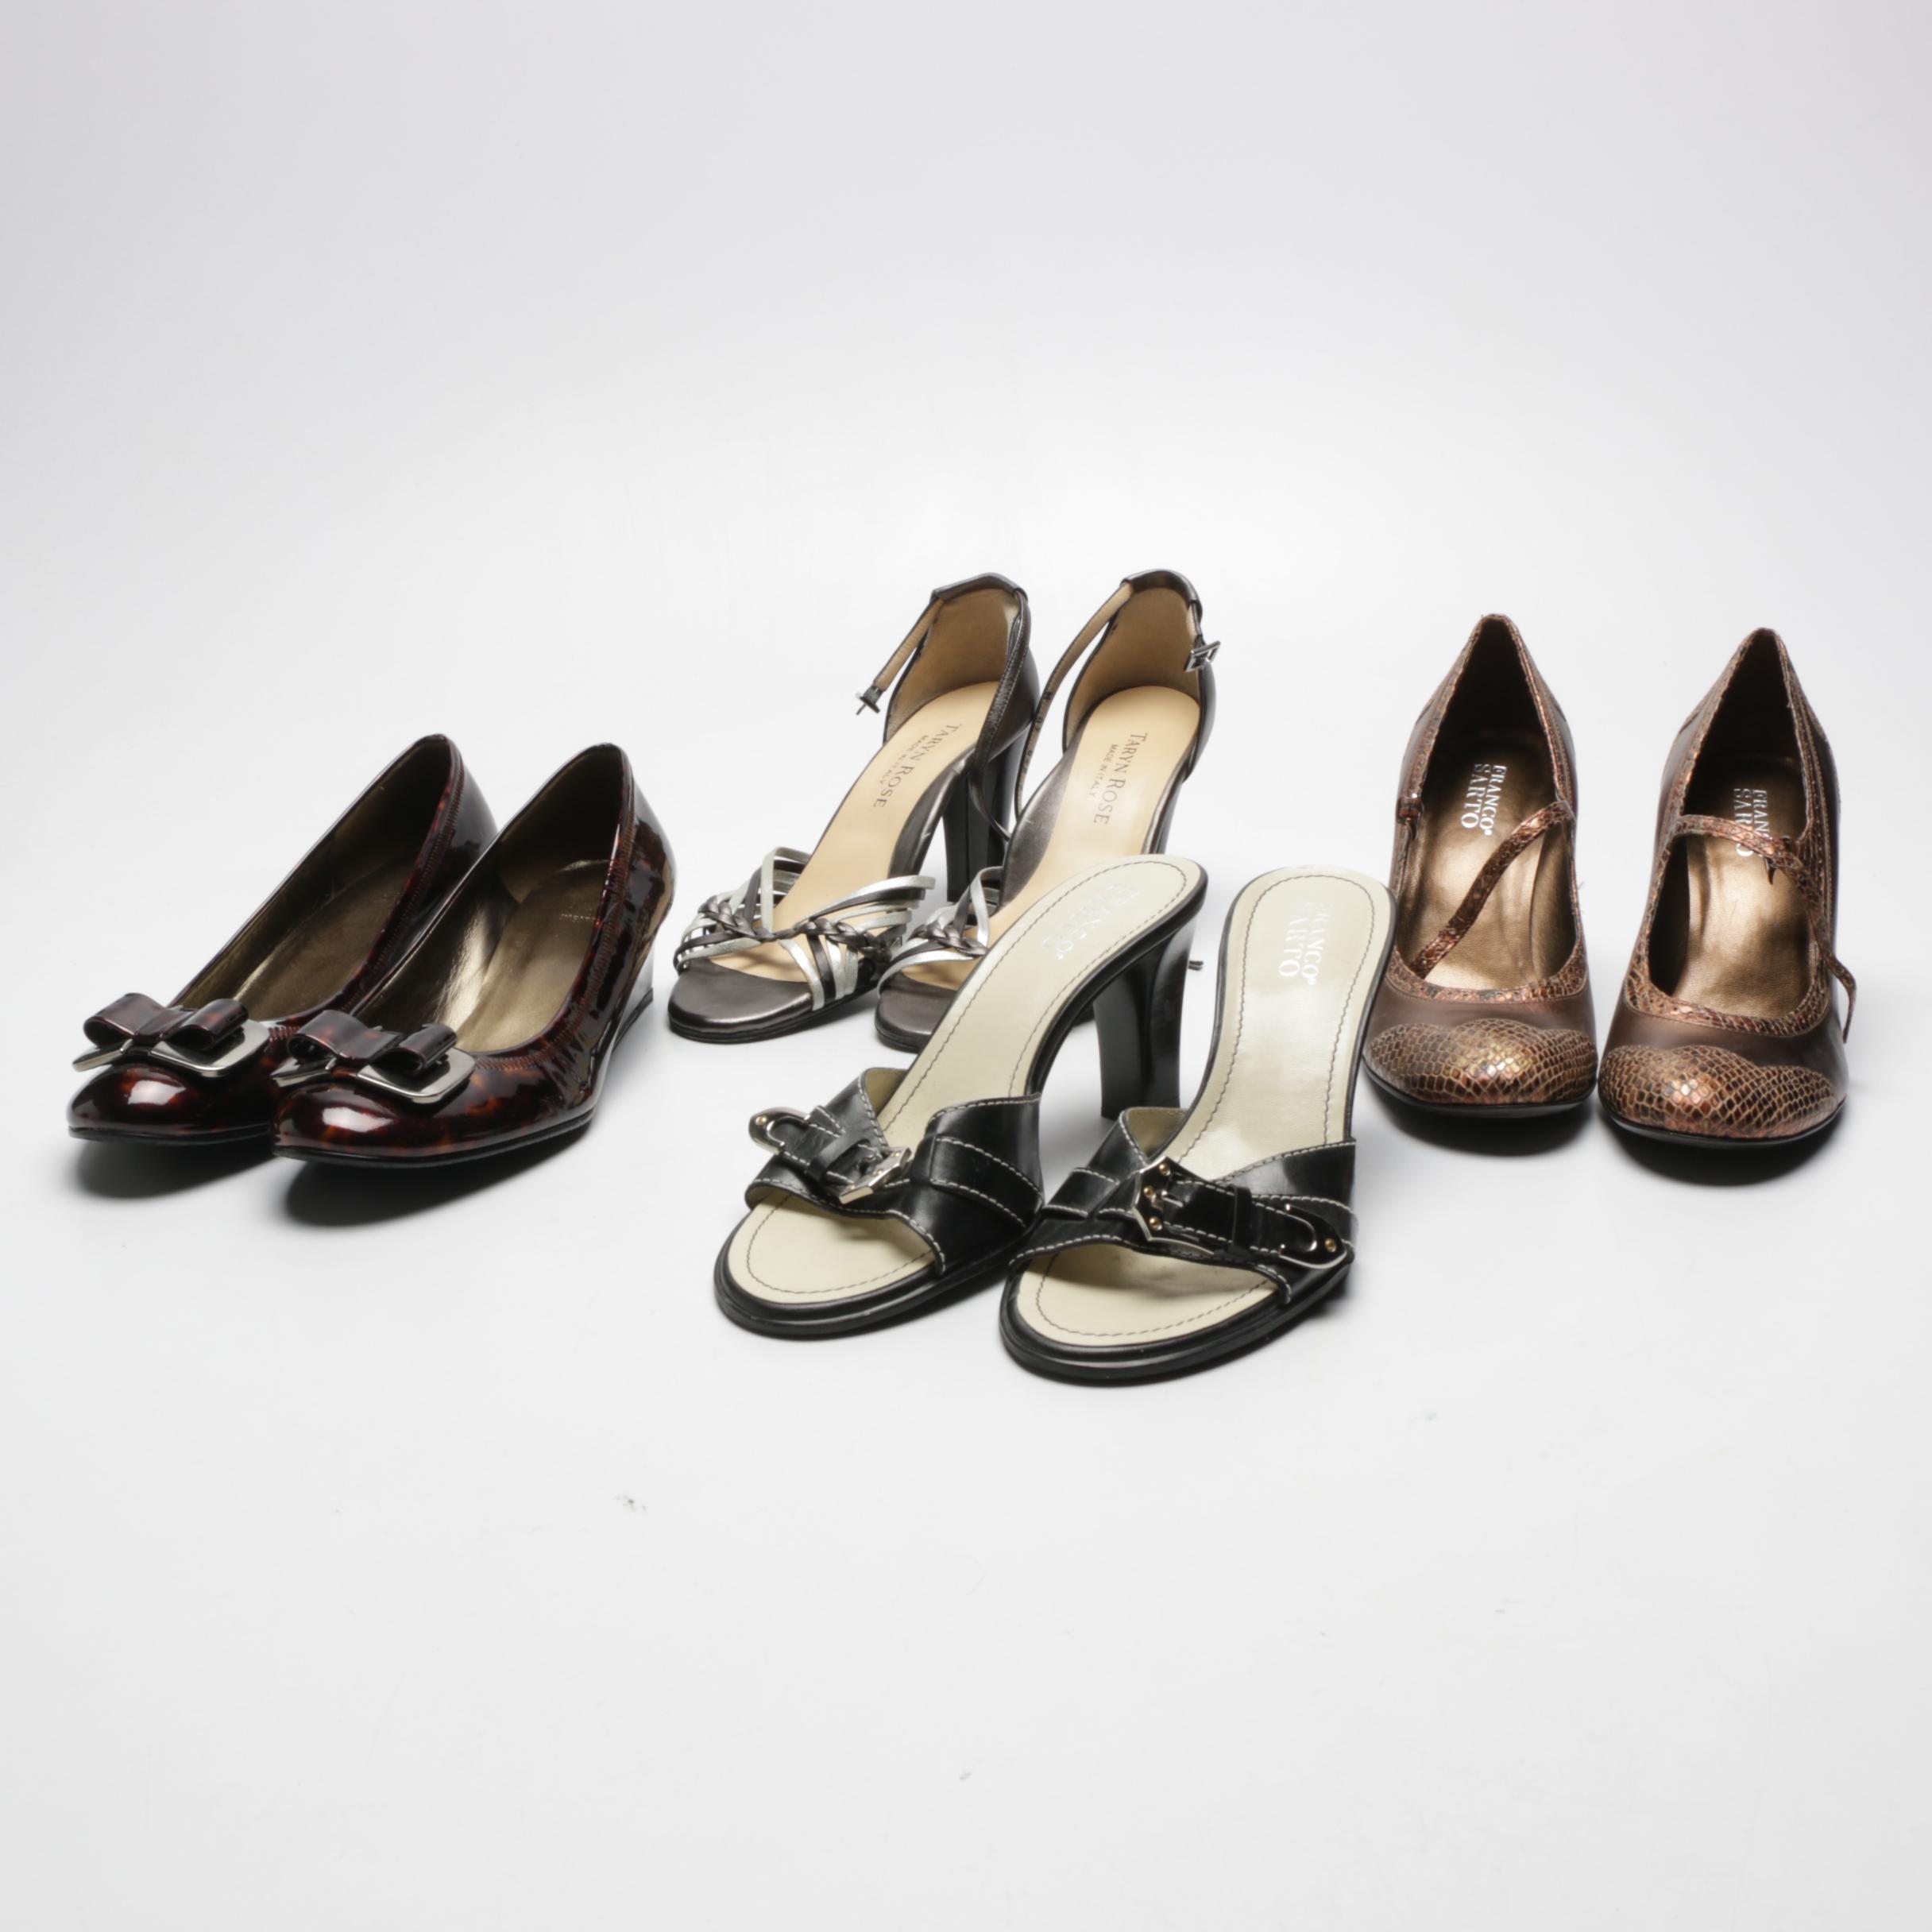 Women's Franco Sarto, Taryn Rose and Stuart Weitzman Heels